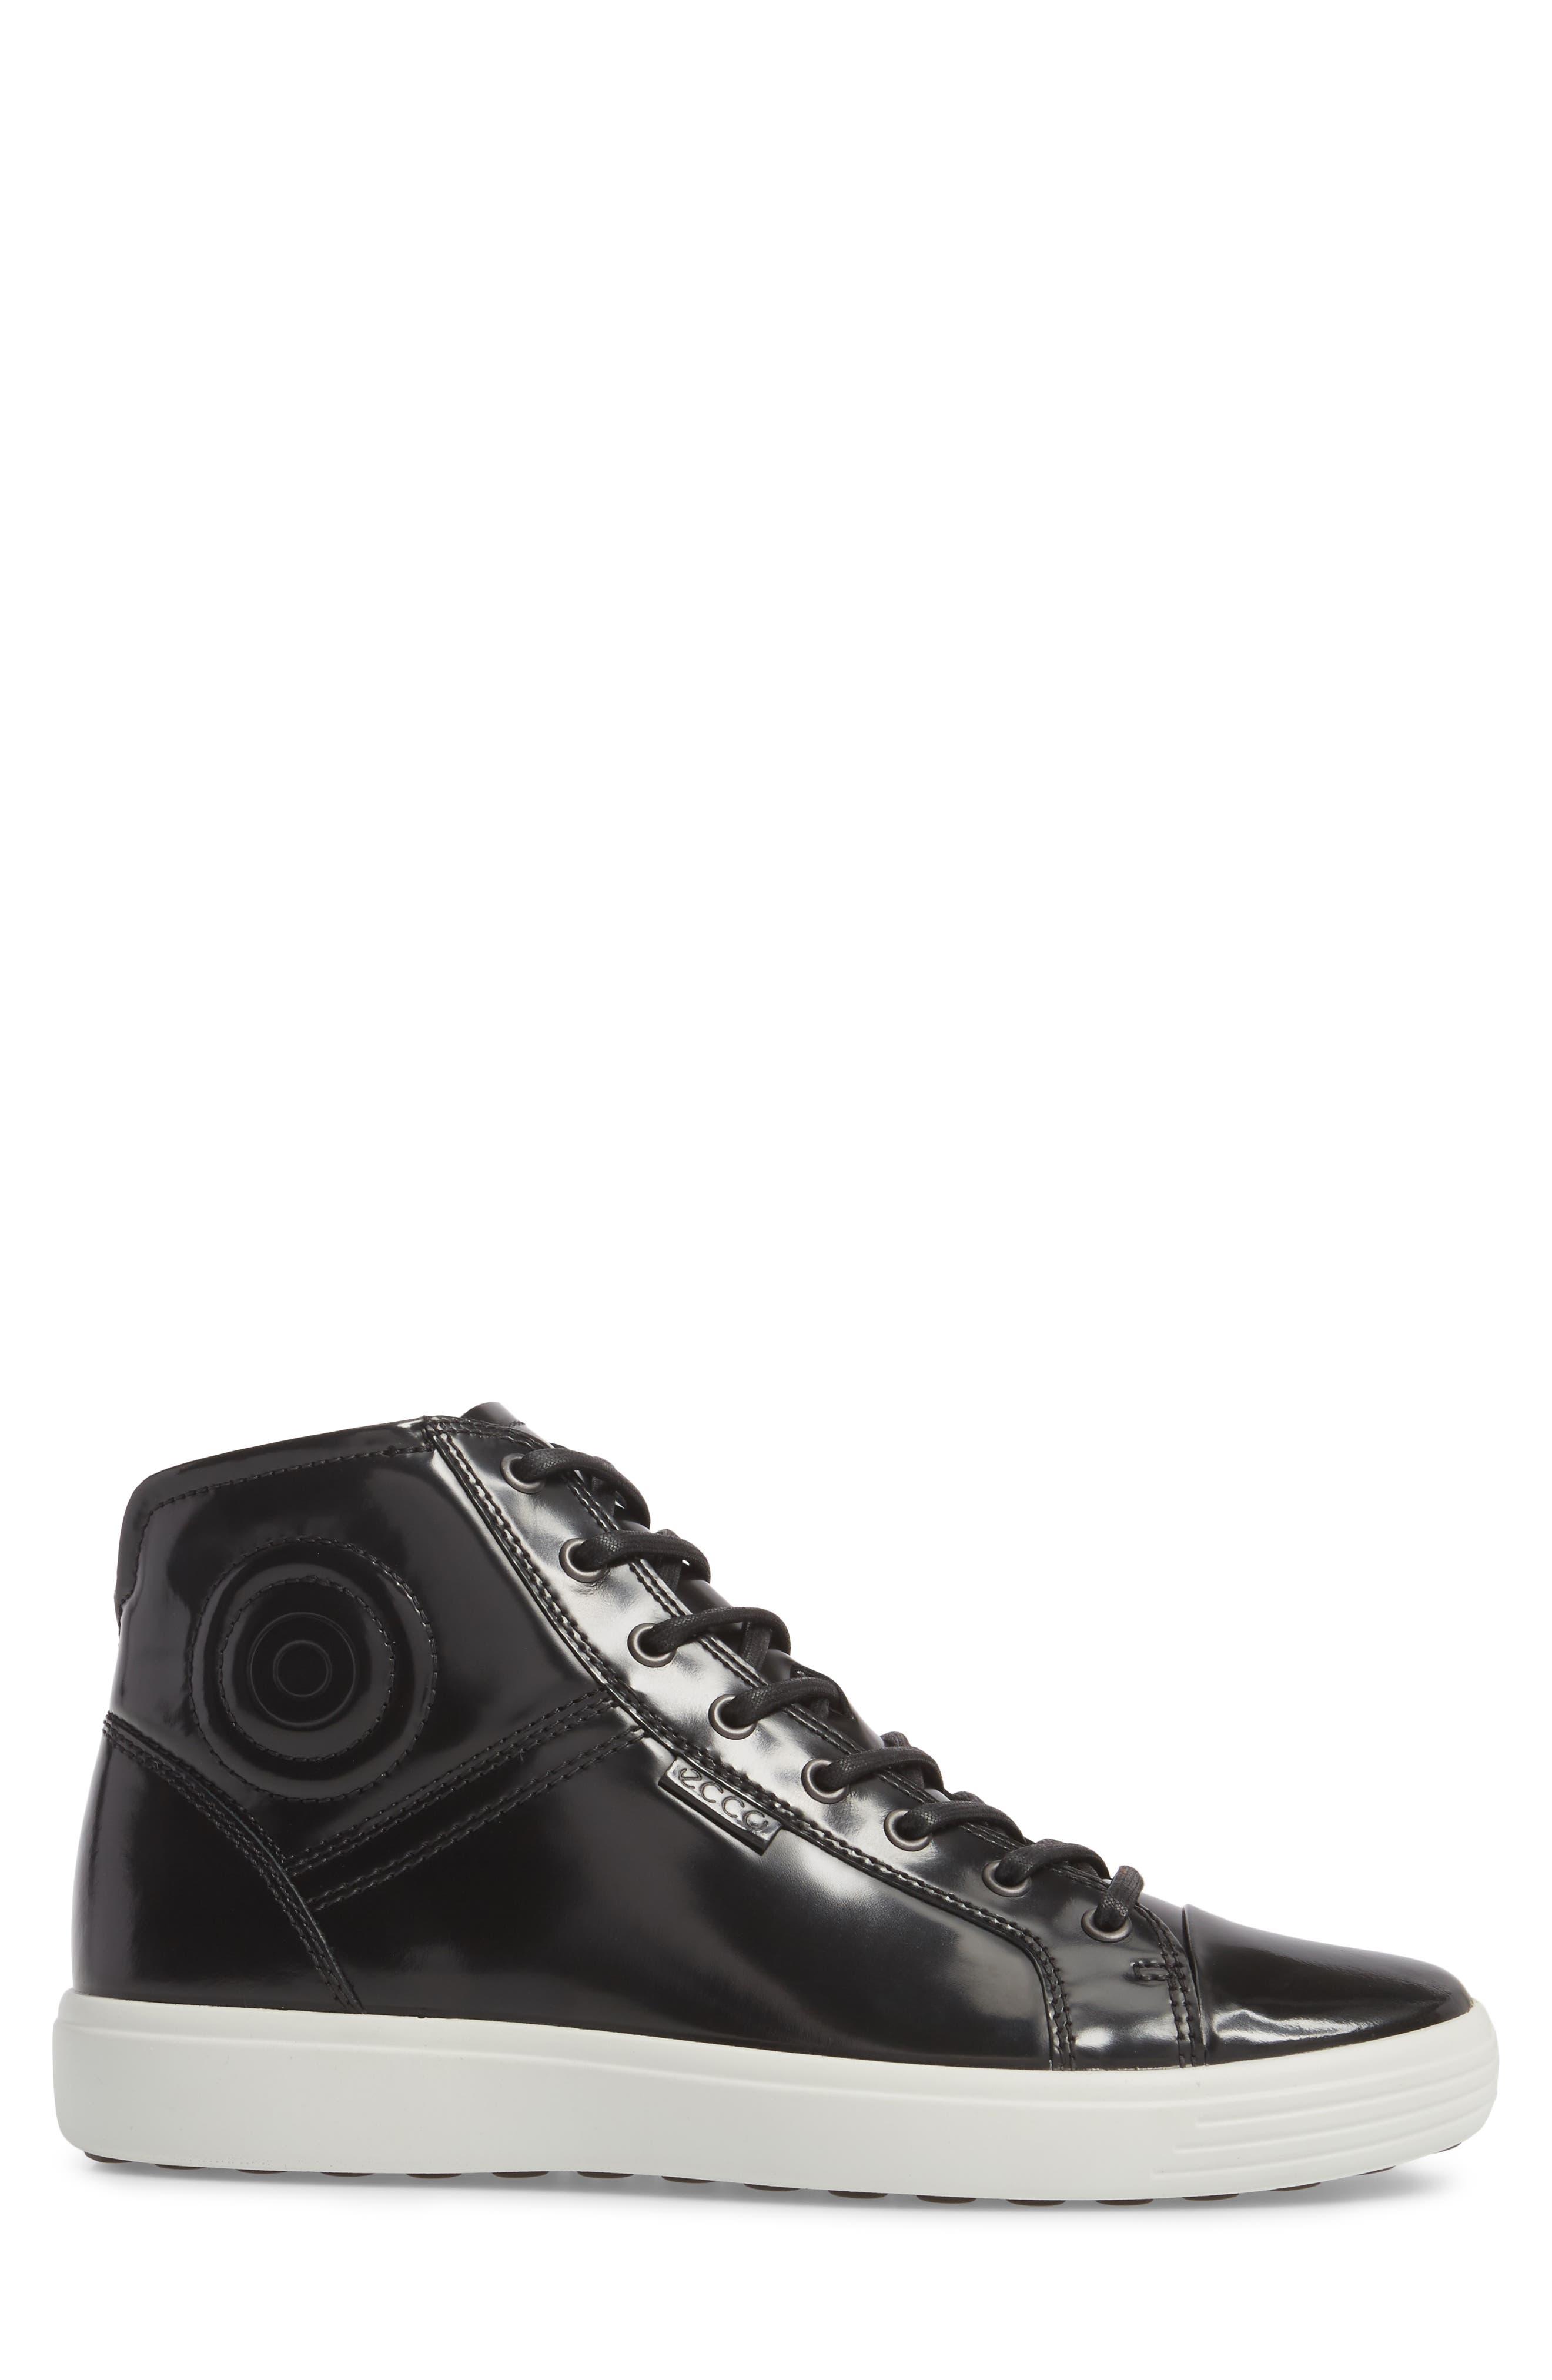 Soft 7 Premium High Top Sneaker,                             Alternate thumbnail 3, color,                             Black Leather